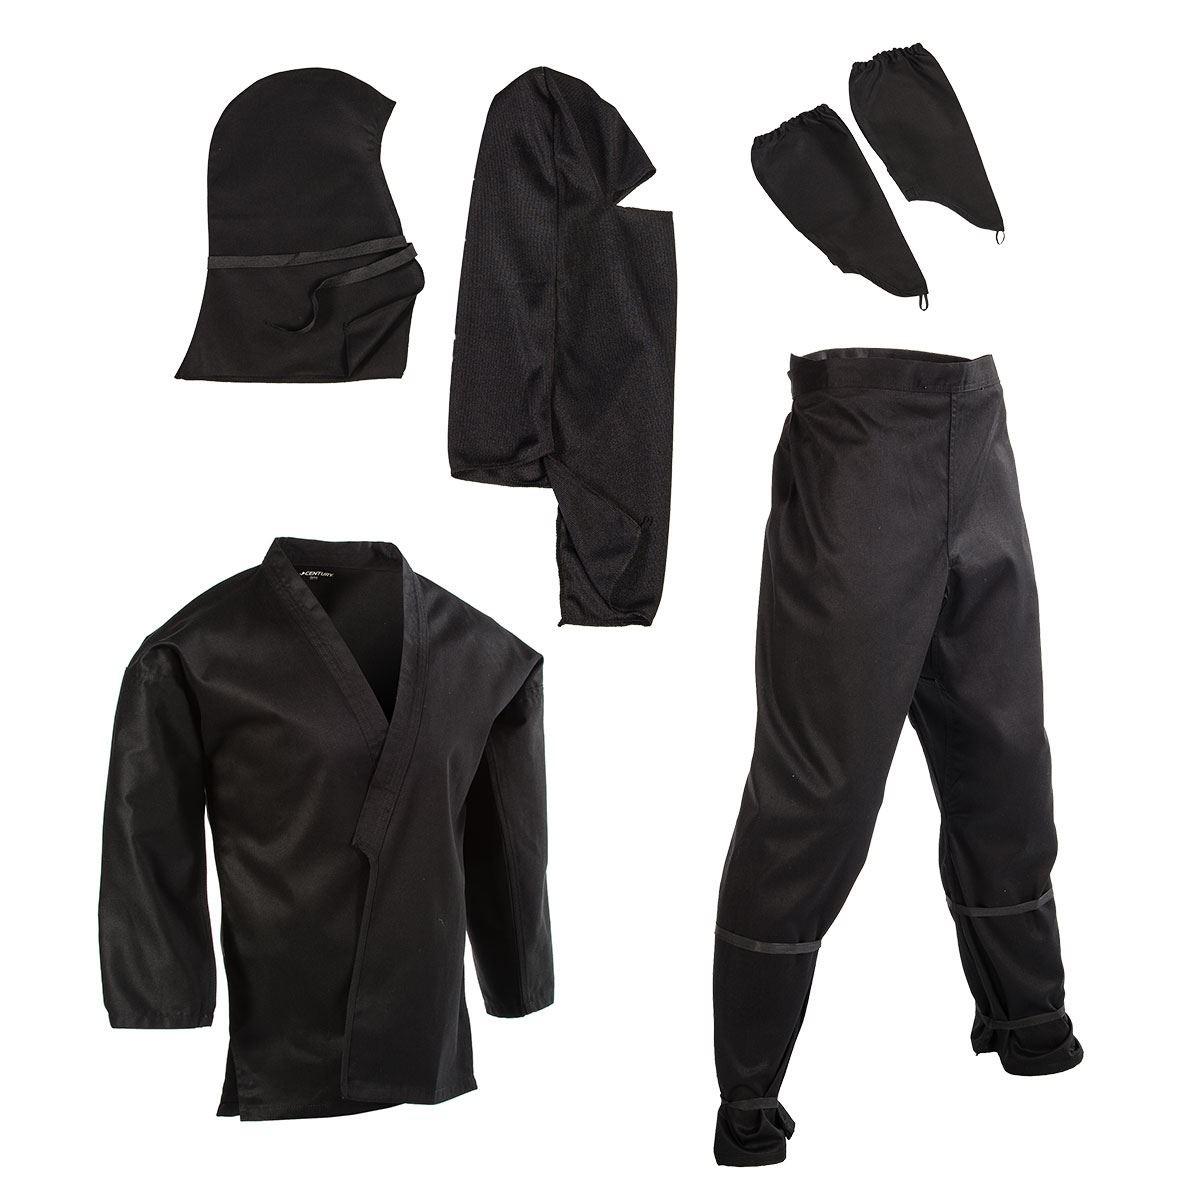 Century Martial Arts Ninja Uniform